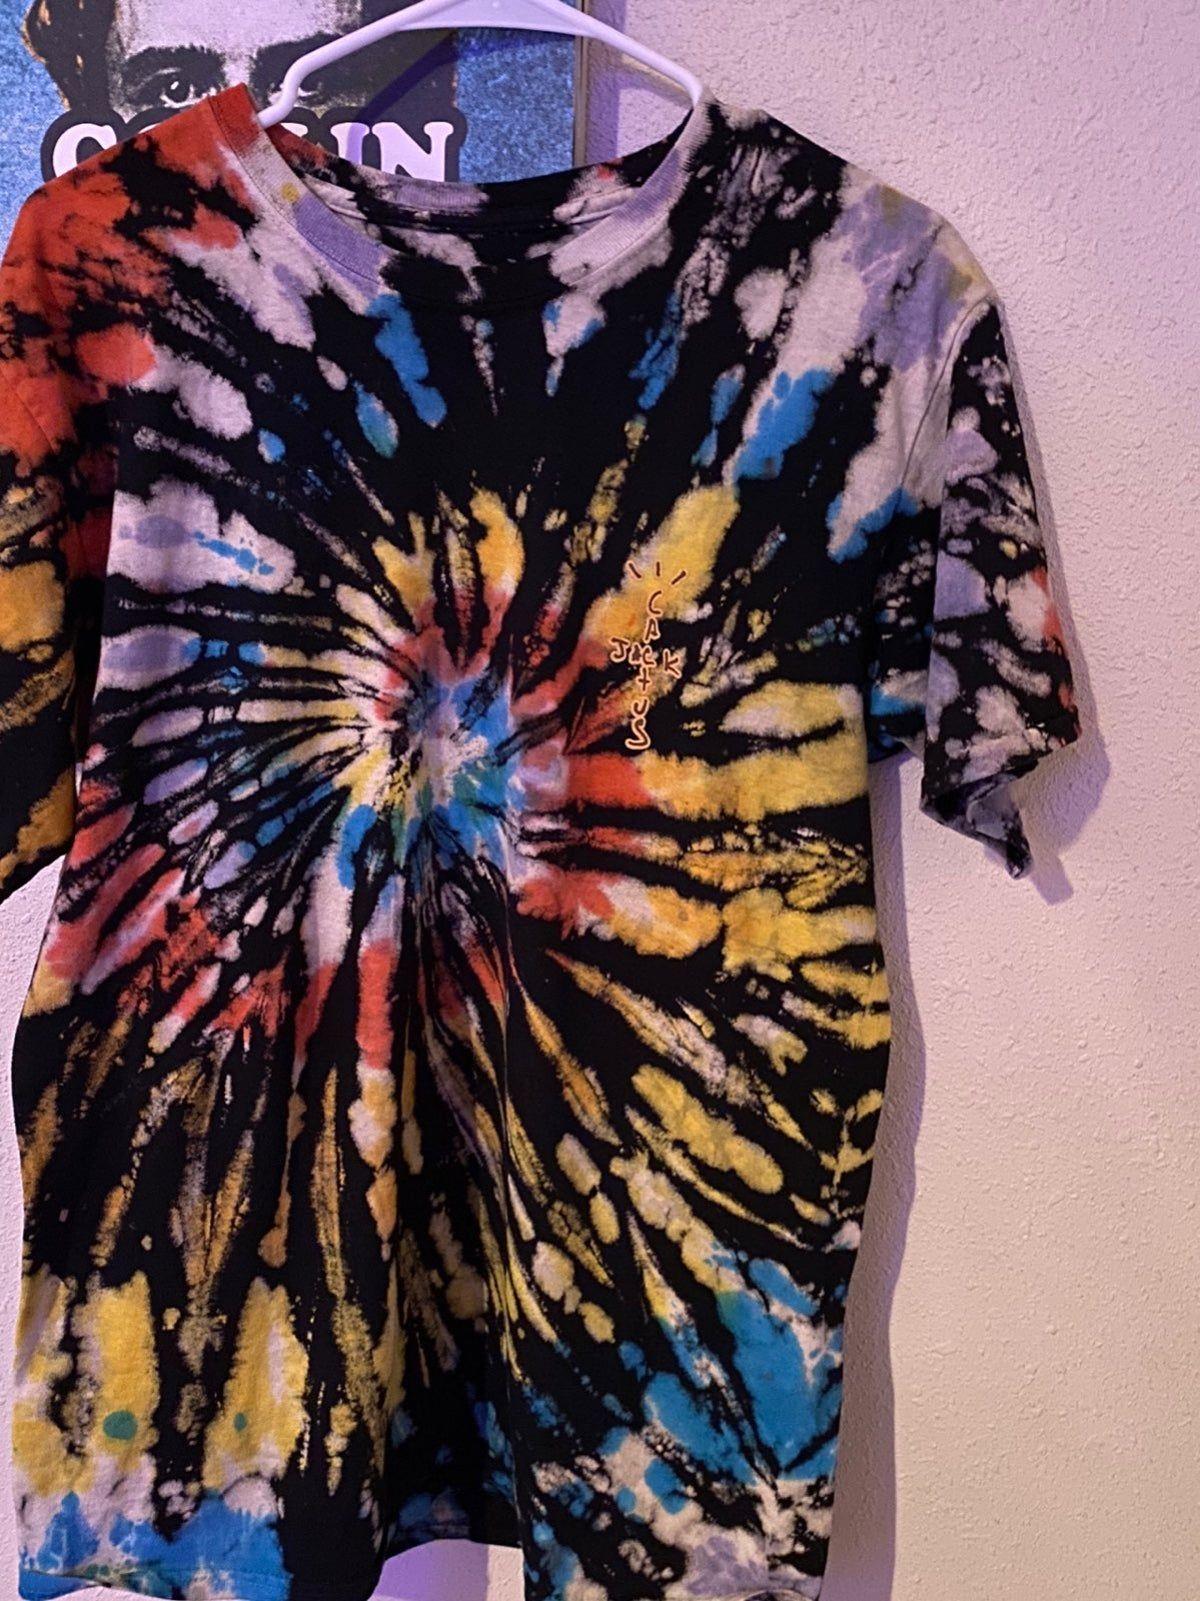 Pin By Sunshine On Trav Travis Scott Shirt Tye Dye Travis Scott [ 1601 x 1200 Pixel ]